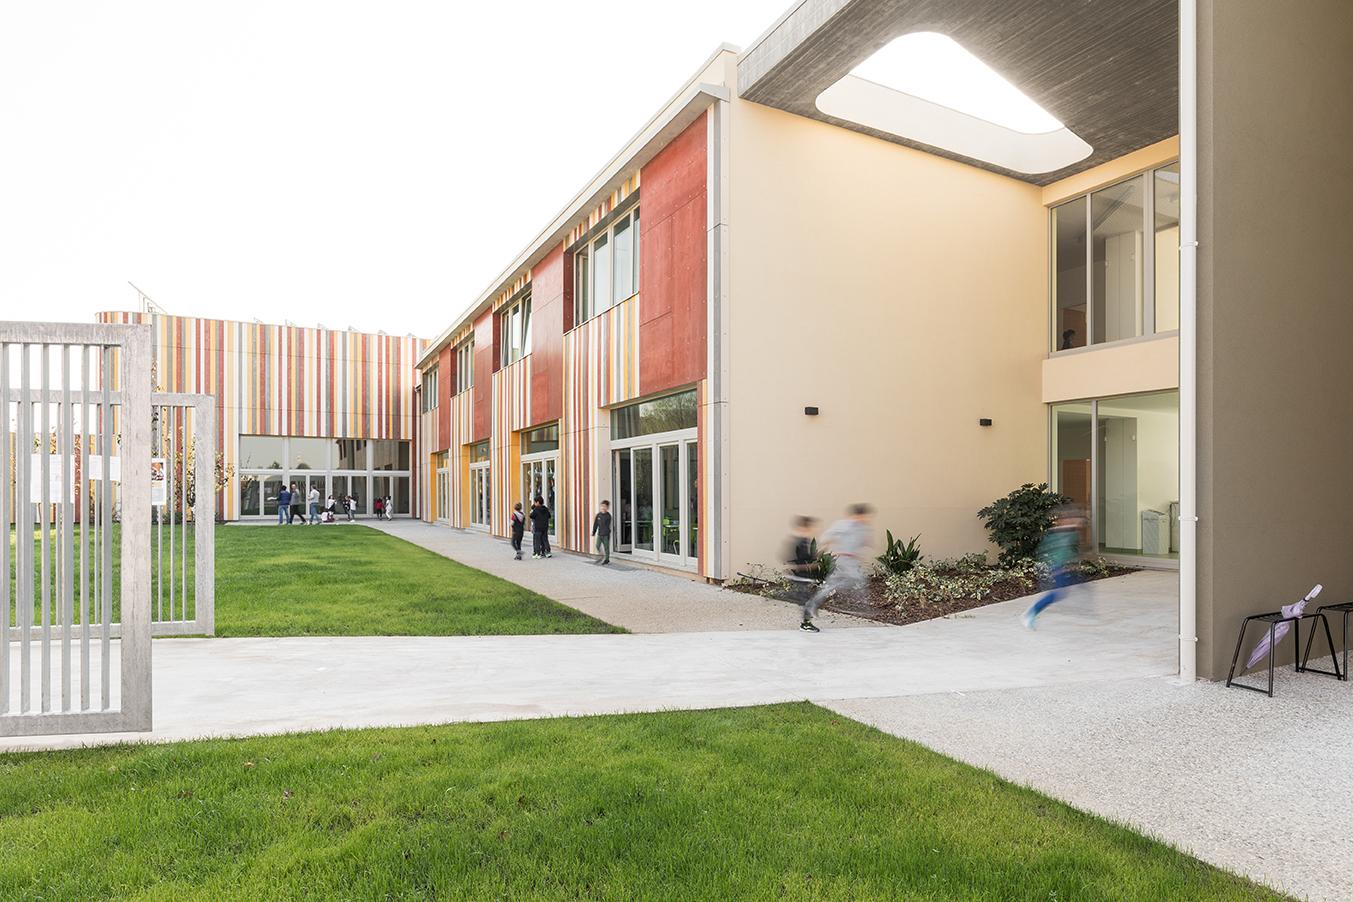 Cernusco sul Naviglio School